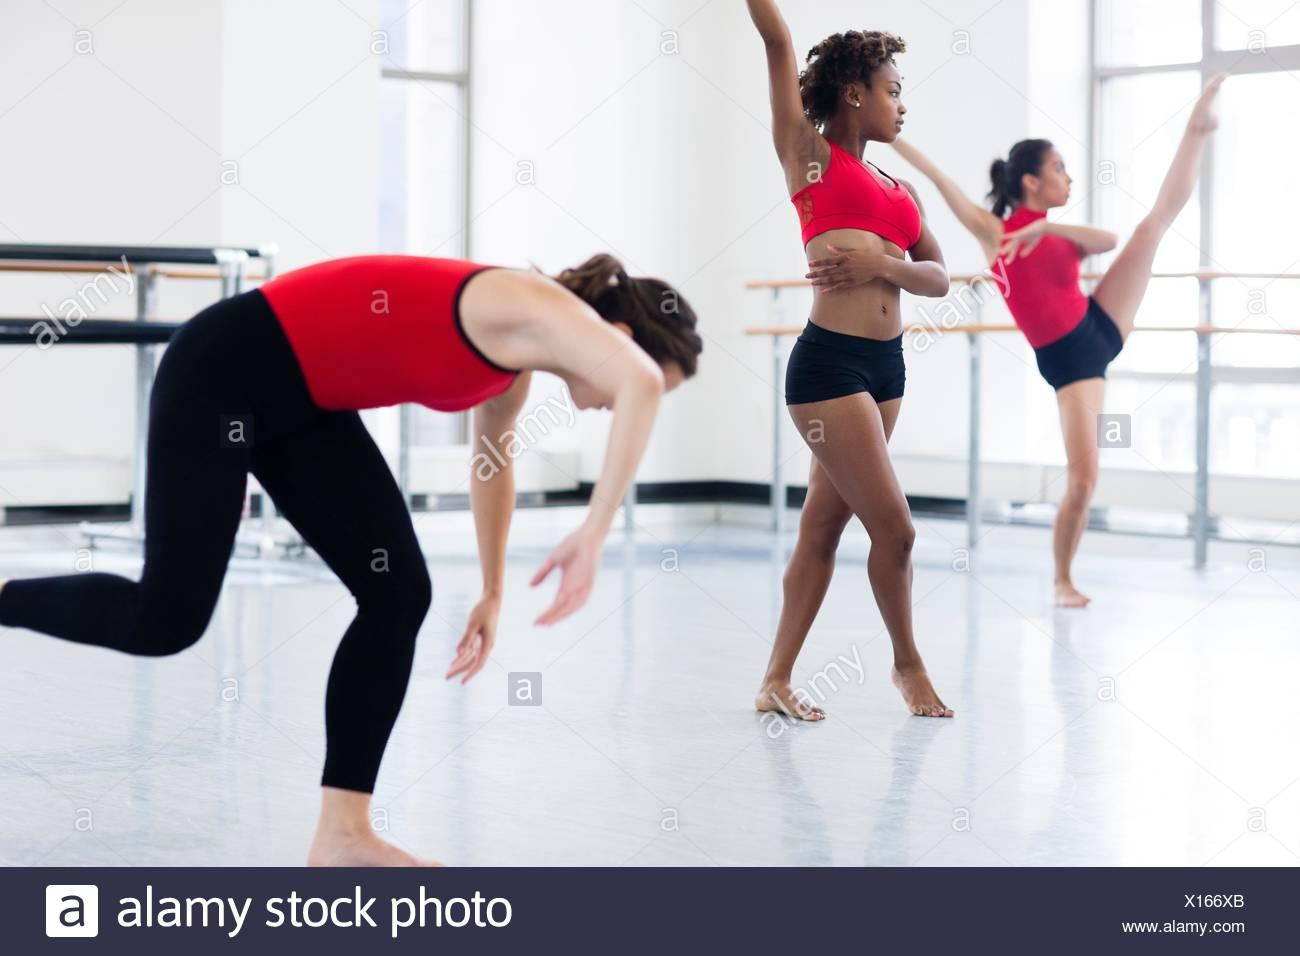 Junge Frauen im Tanz Studio tanzen Stockbild